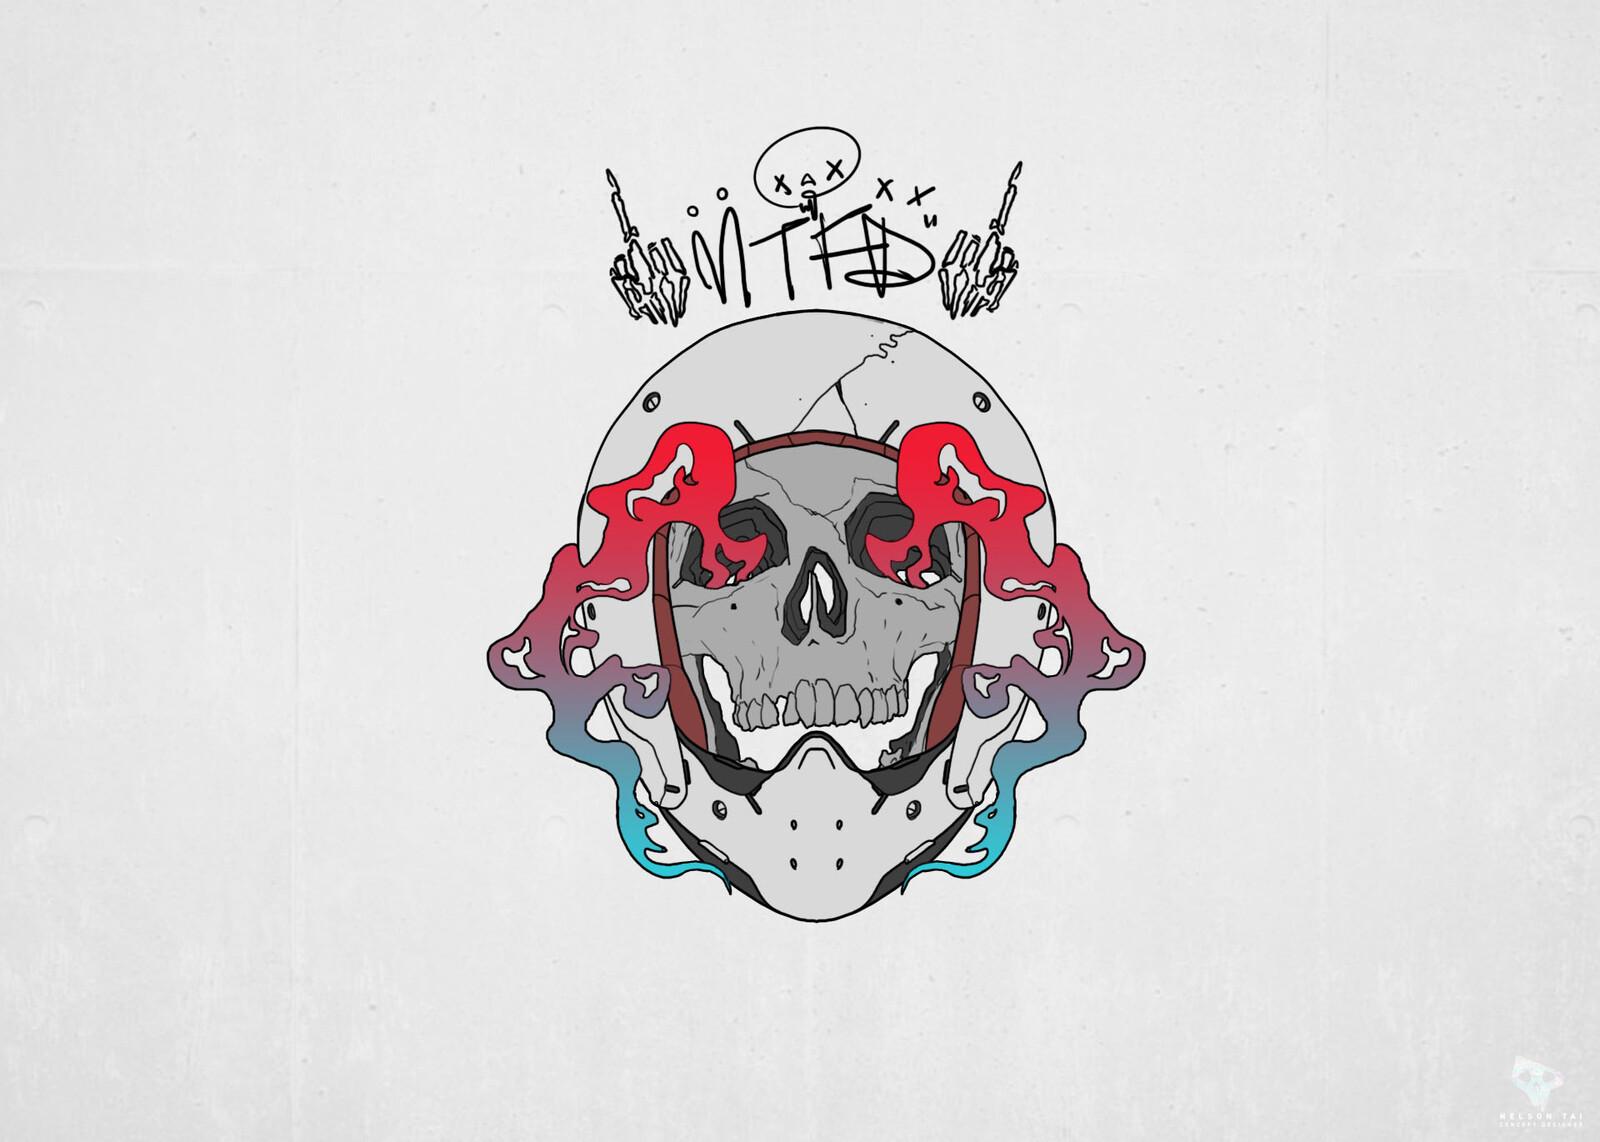 motofridayz helmet skull graphic xx